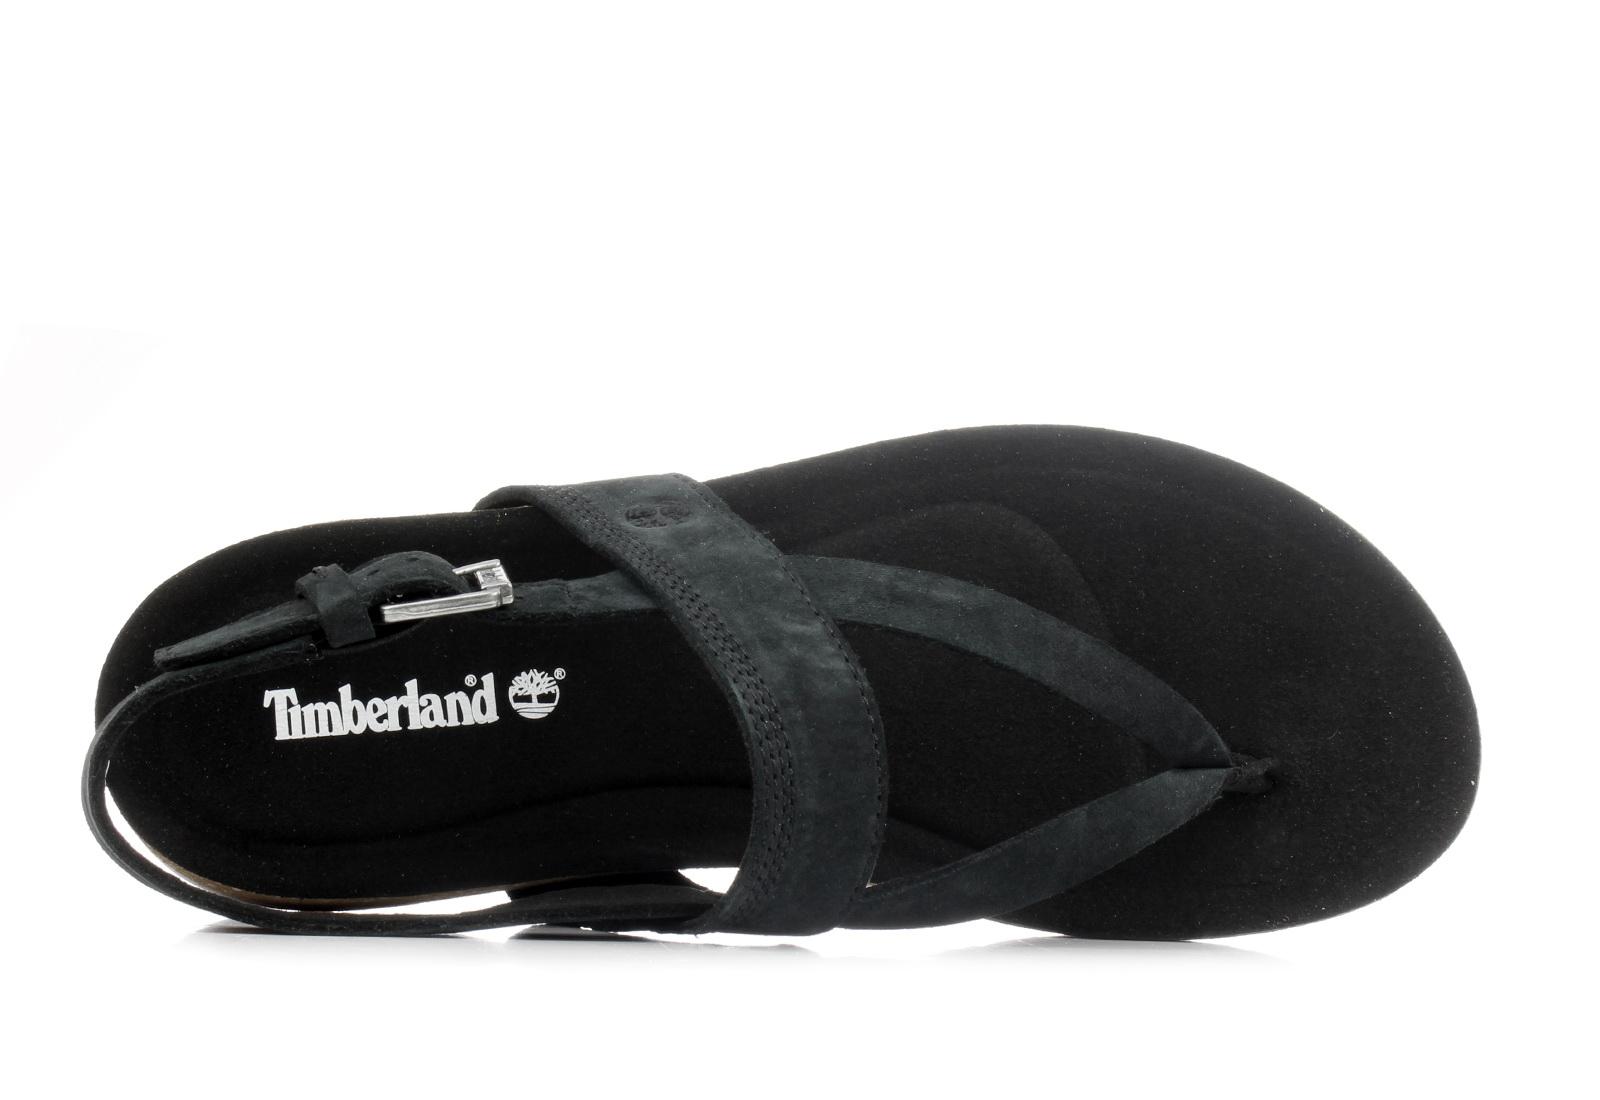 7243db57e3 Timberland Szandál - Malibu Waves - A1PGG-BLK - Office Shoes ...